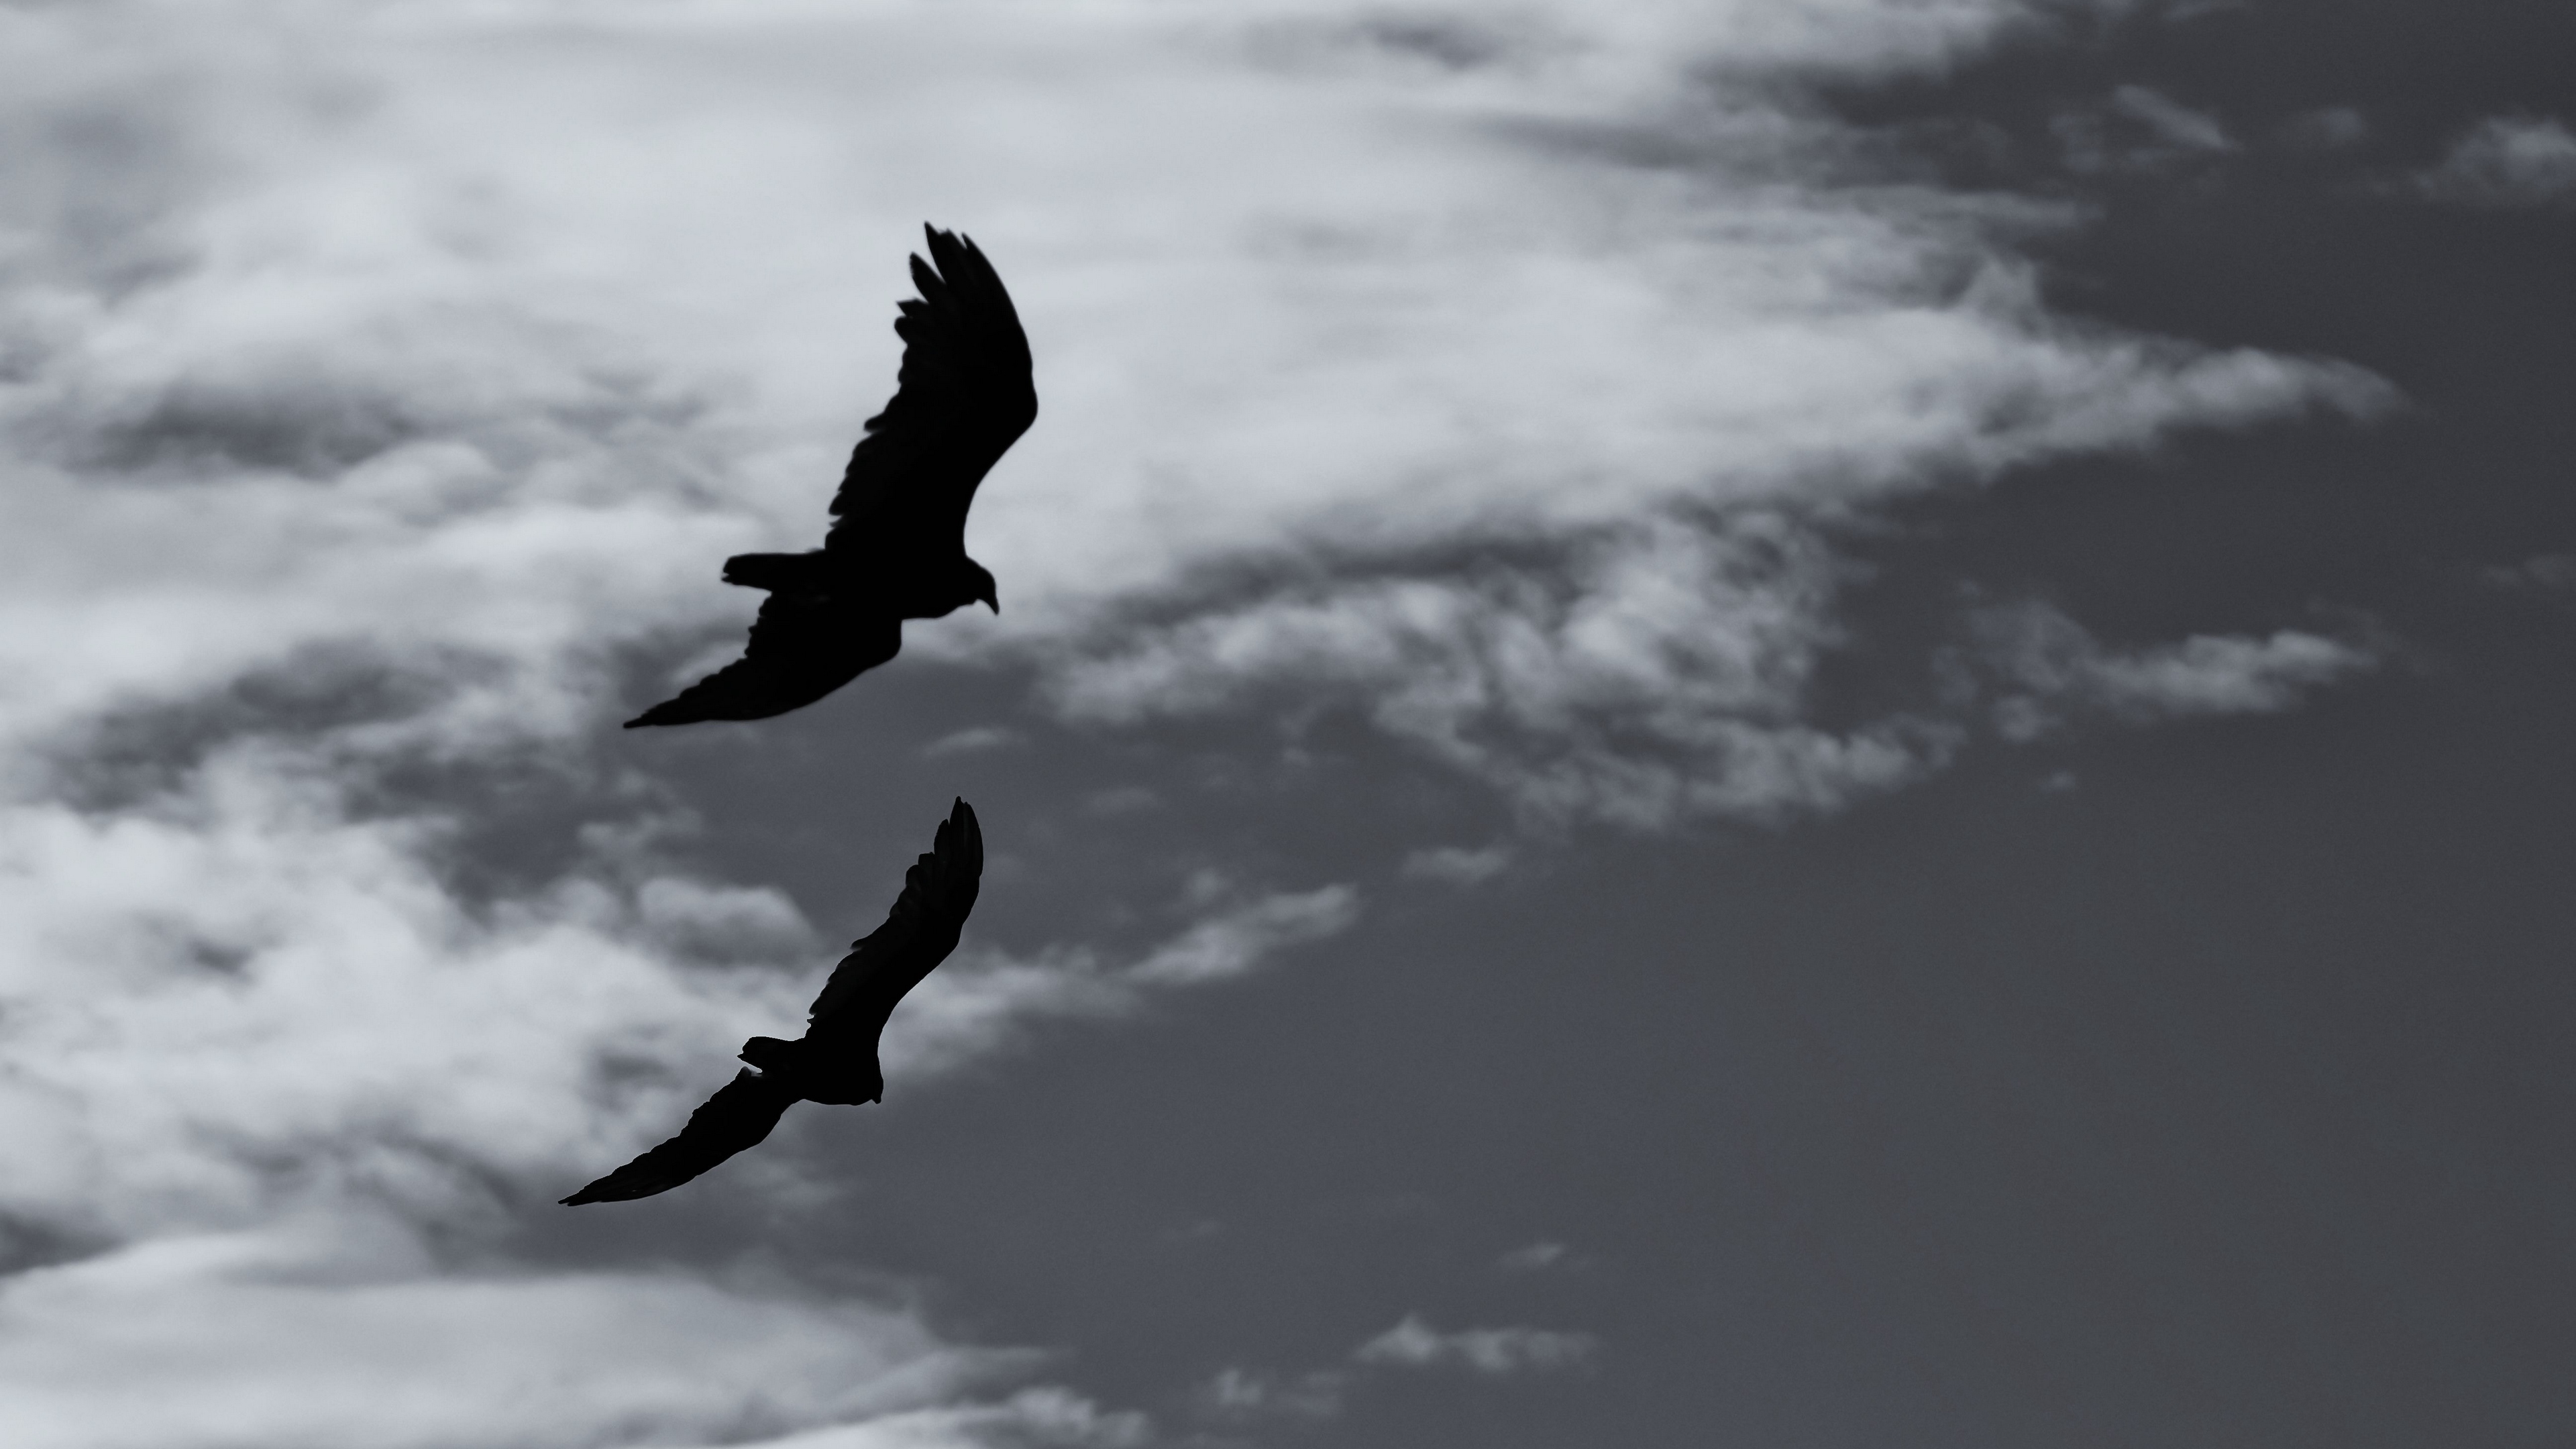 birds silhouette flight sky bw 4k 1540574462 - birds, silhouette, flight, sky, bw 4k - Silhouette, Flight, Birds